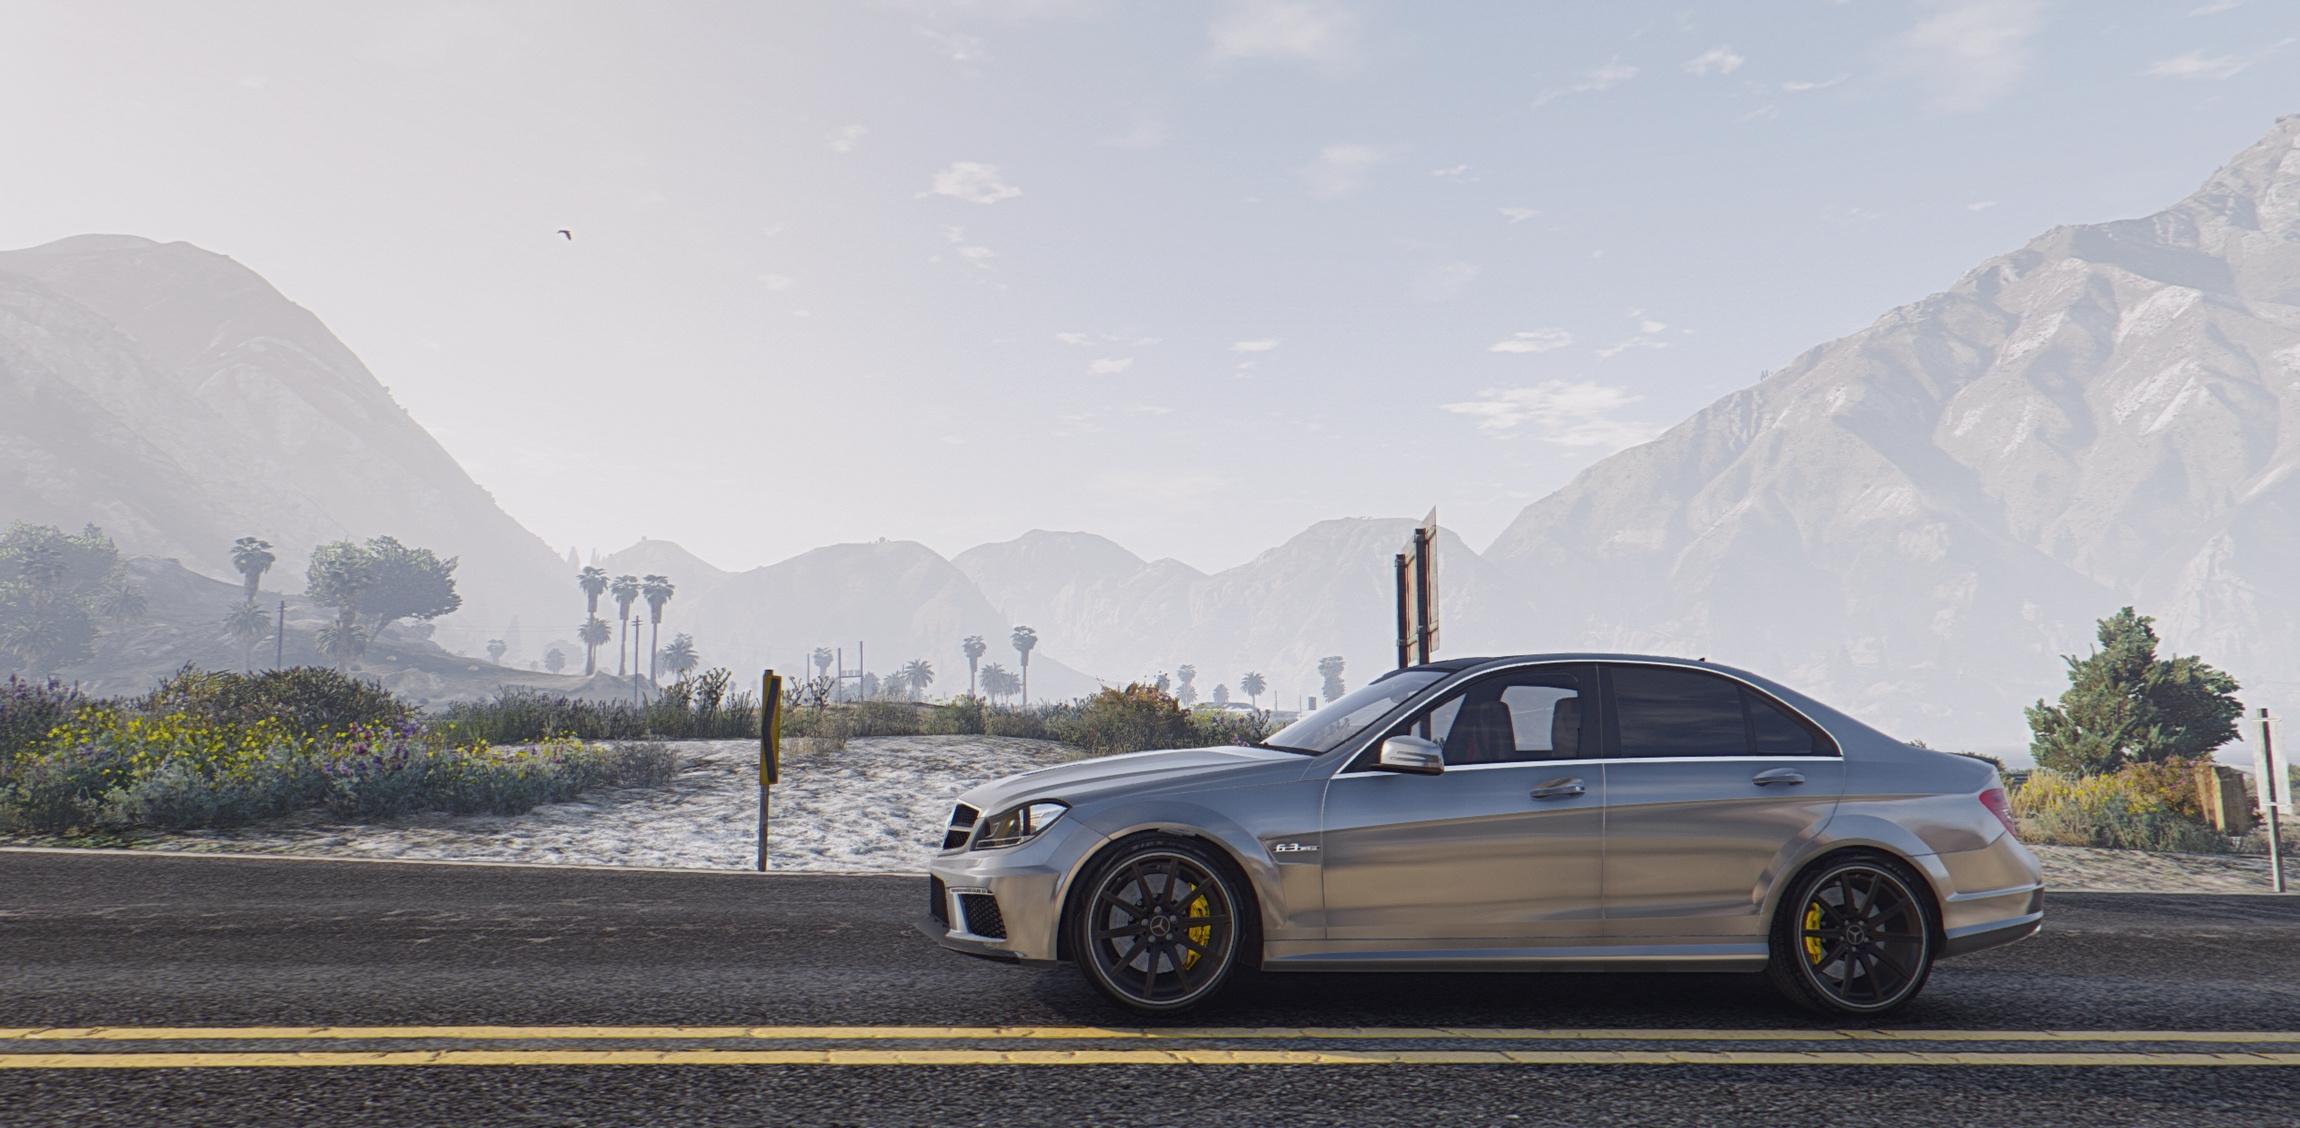 Mercedes Benz C63 AMG GTA5 Mods